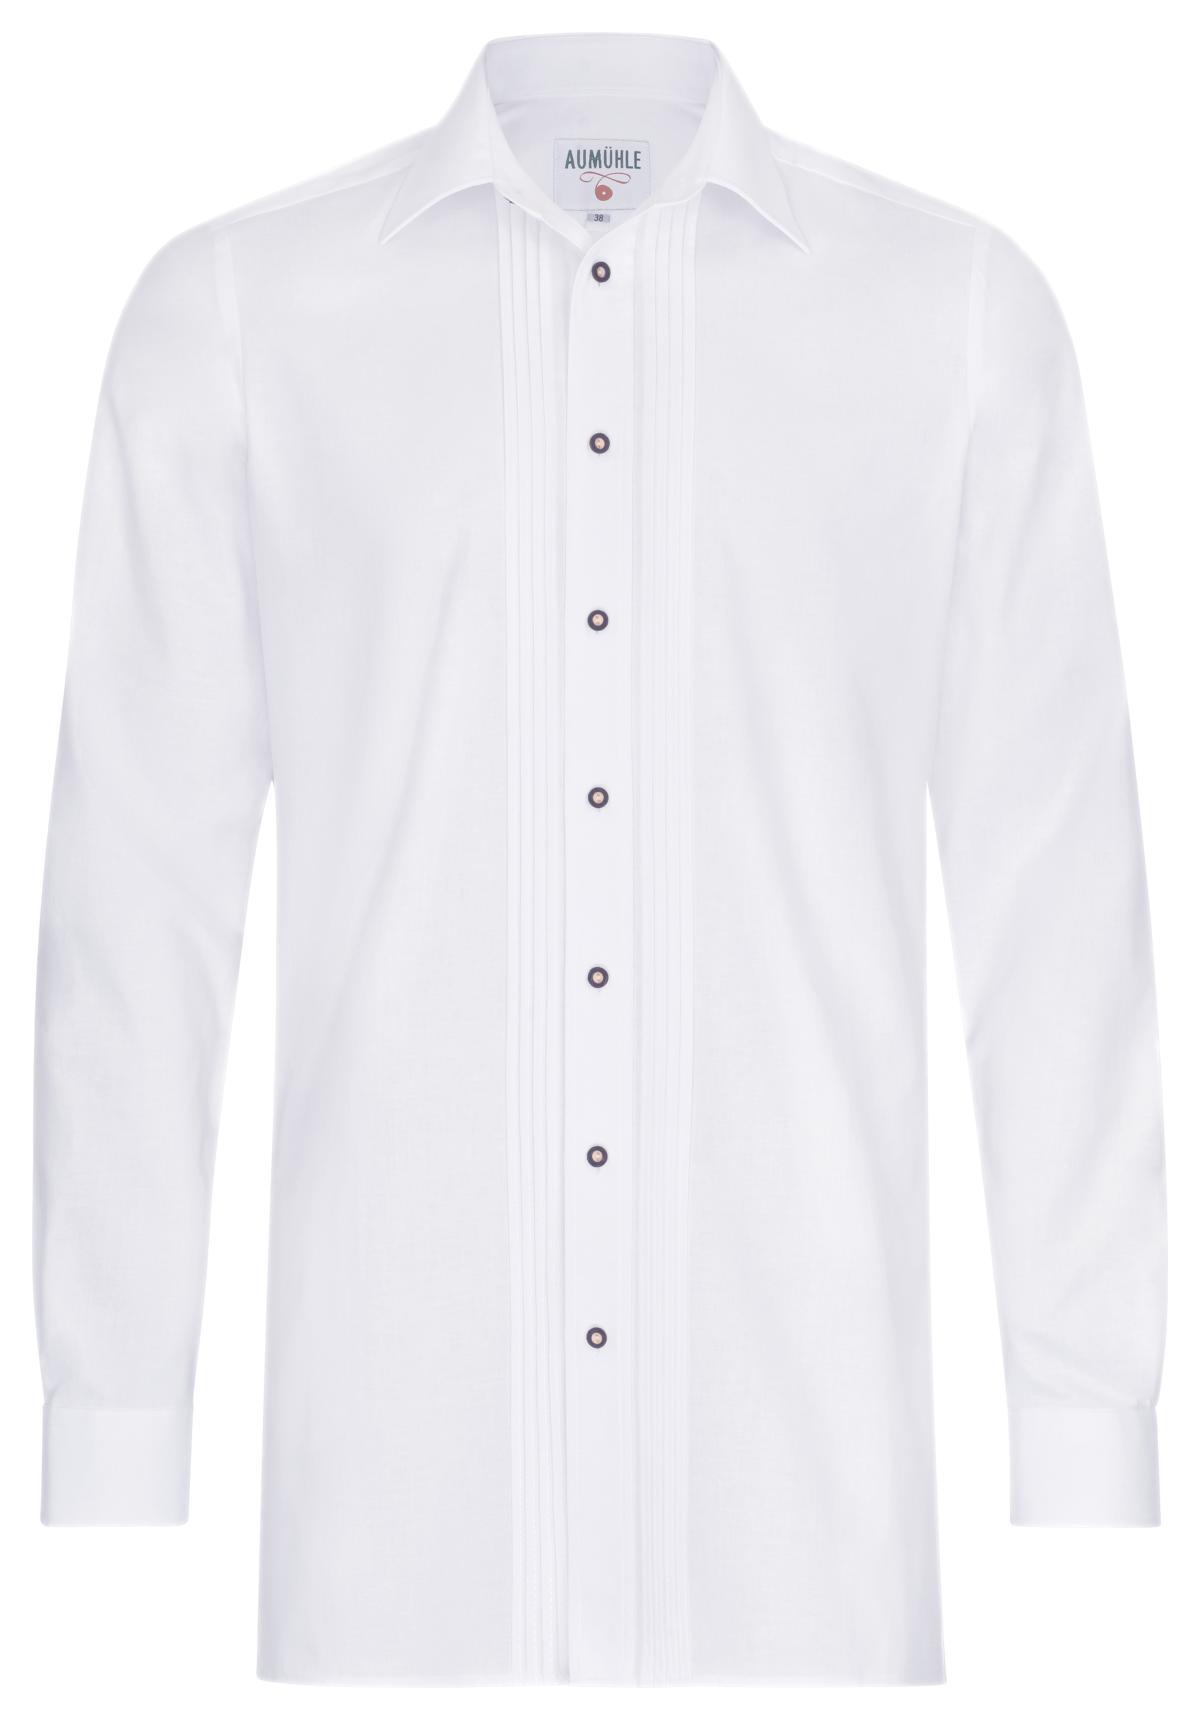 Trachtenhemd - Aying XL-Arm